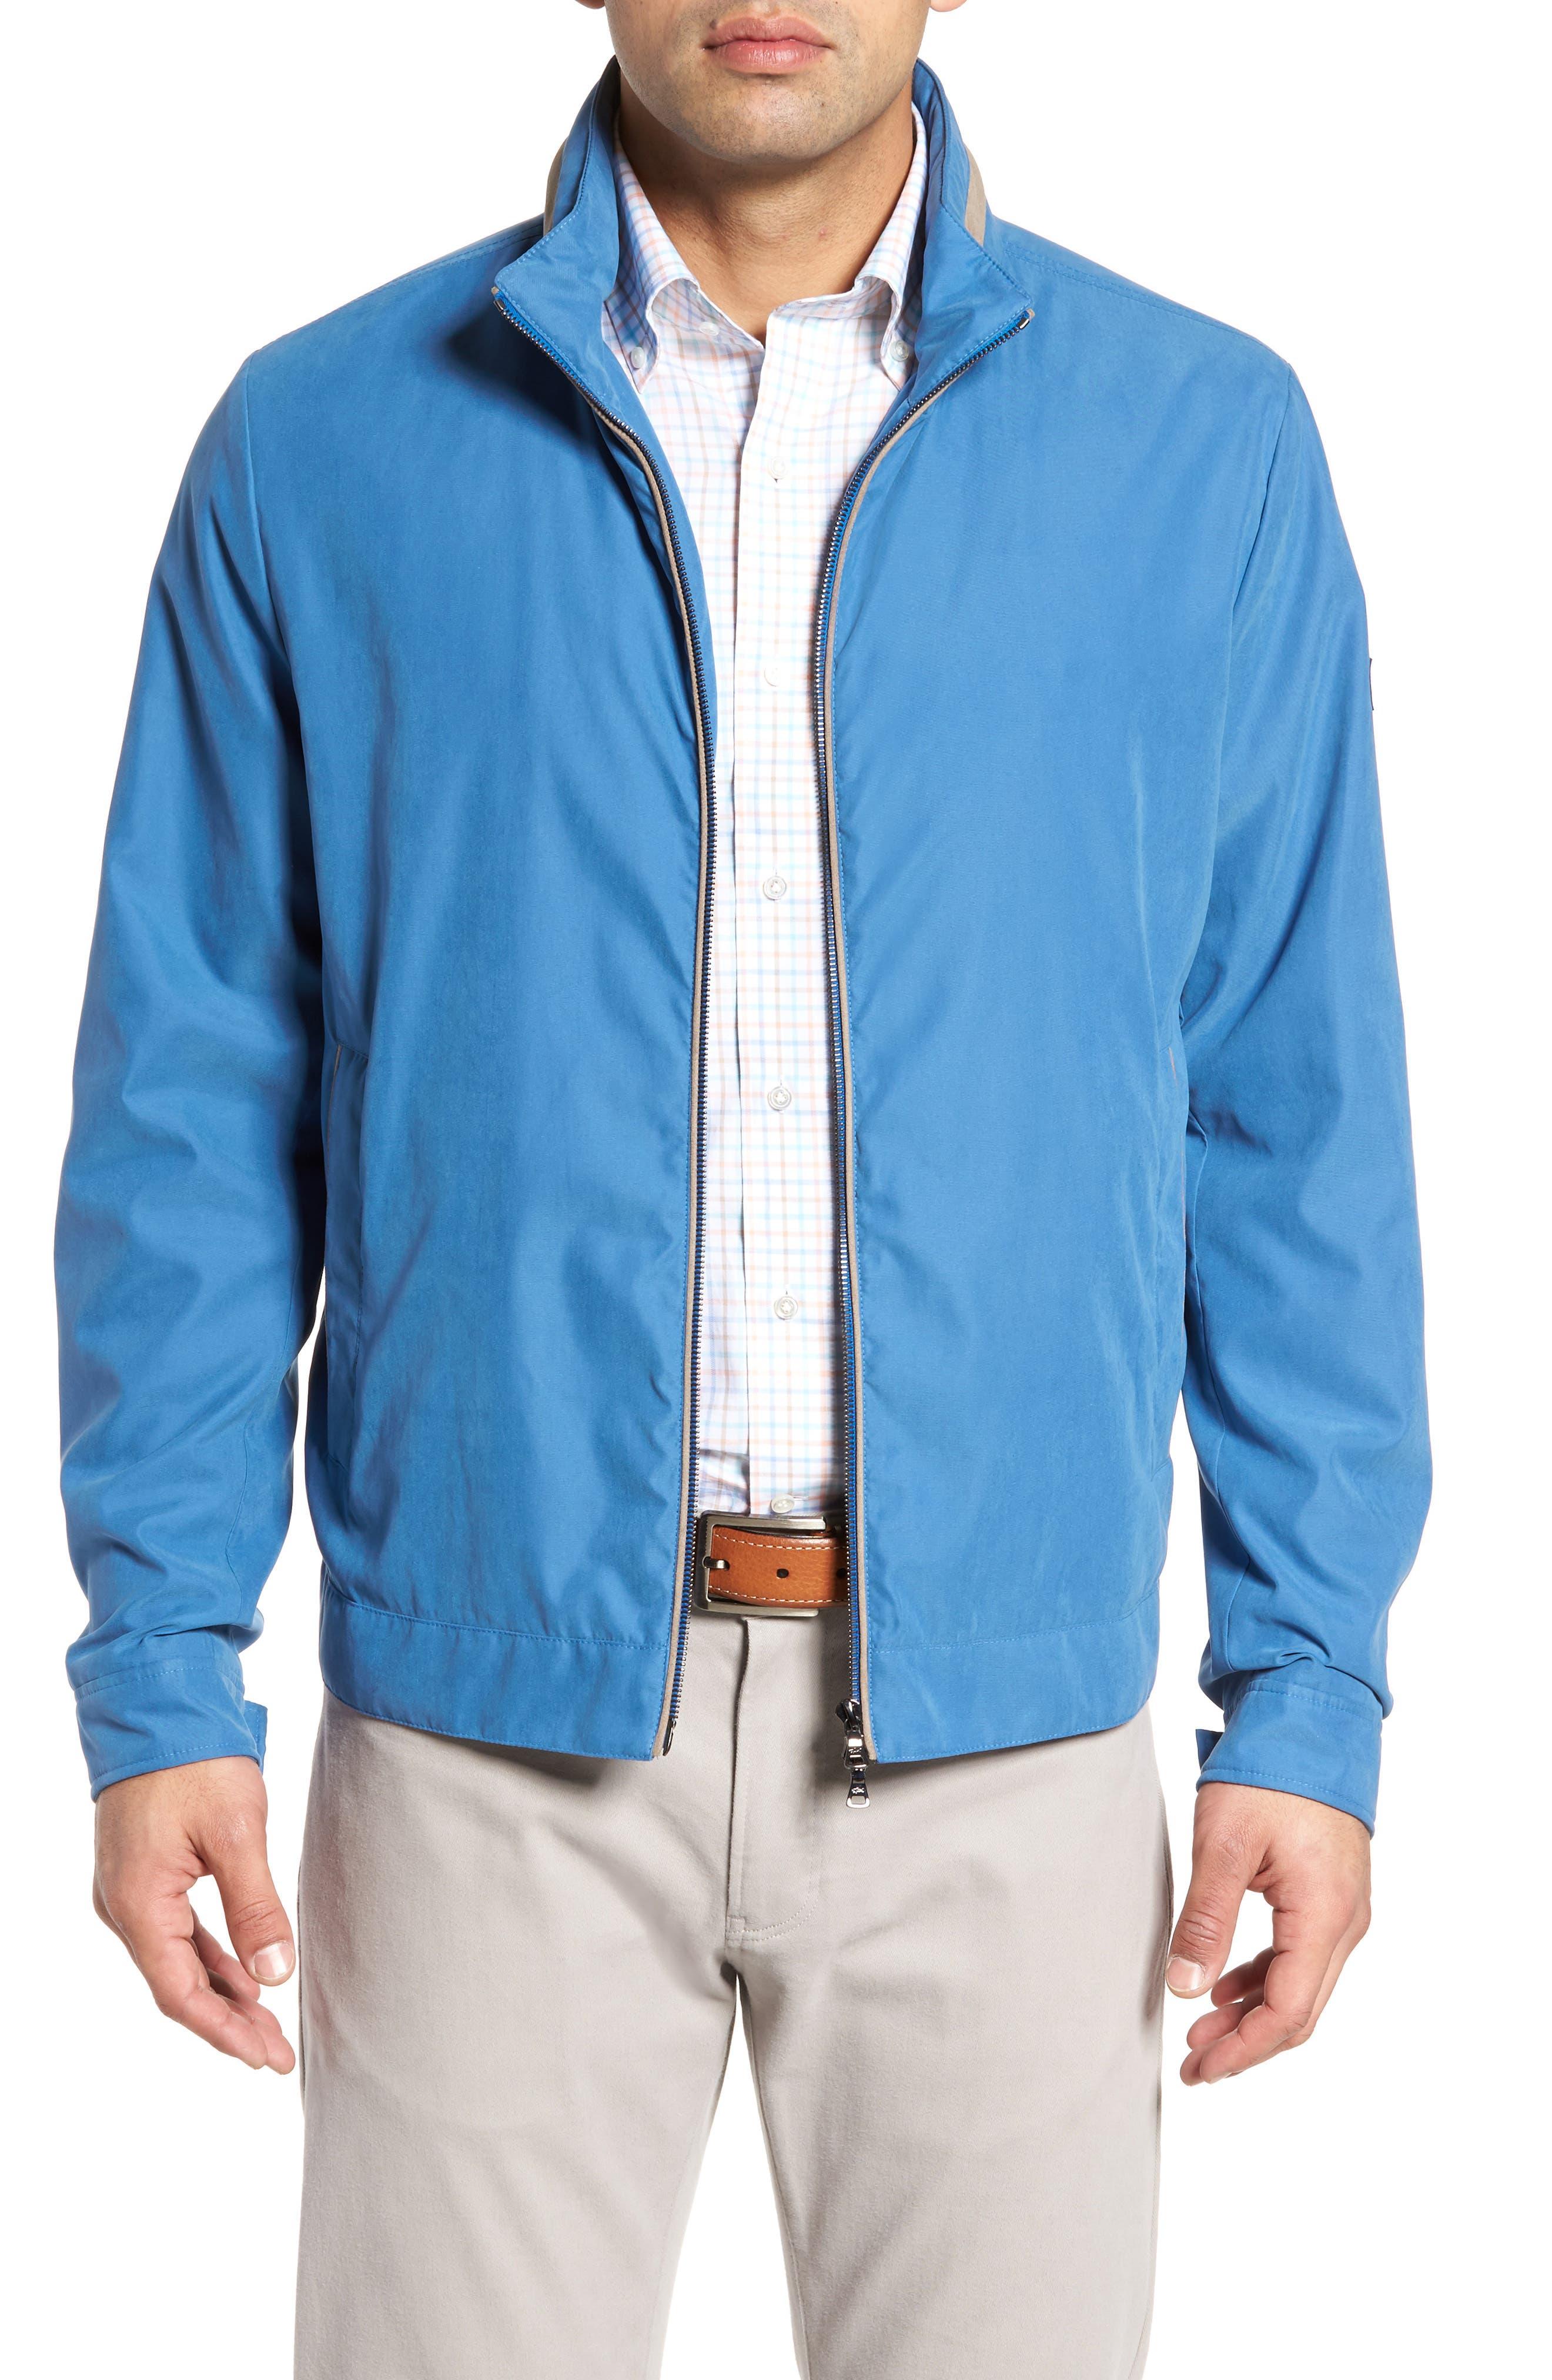 Paul&Shark Water Repellent Microfiber Jacket,                         Main,                         color, Blue